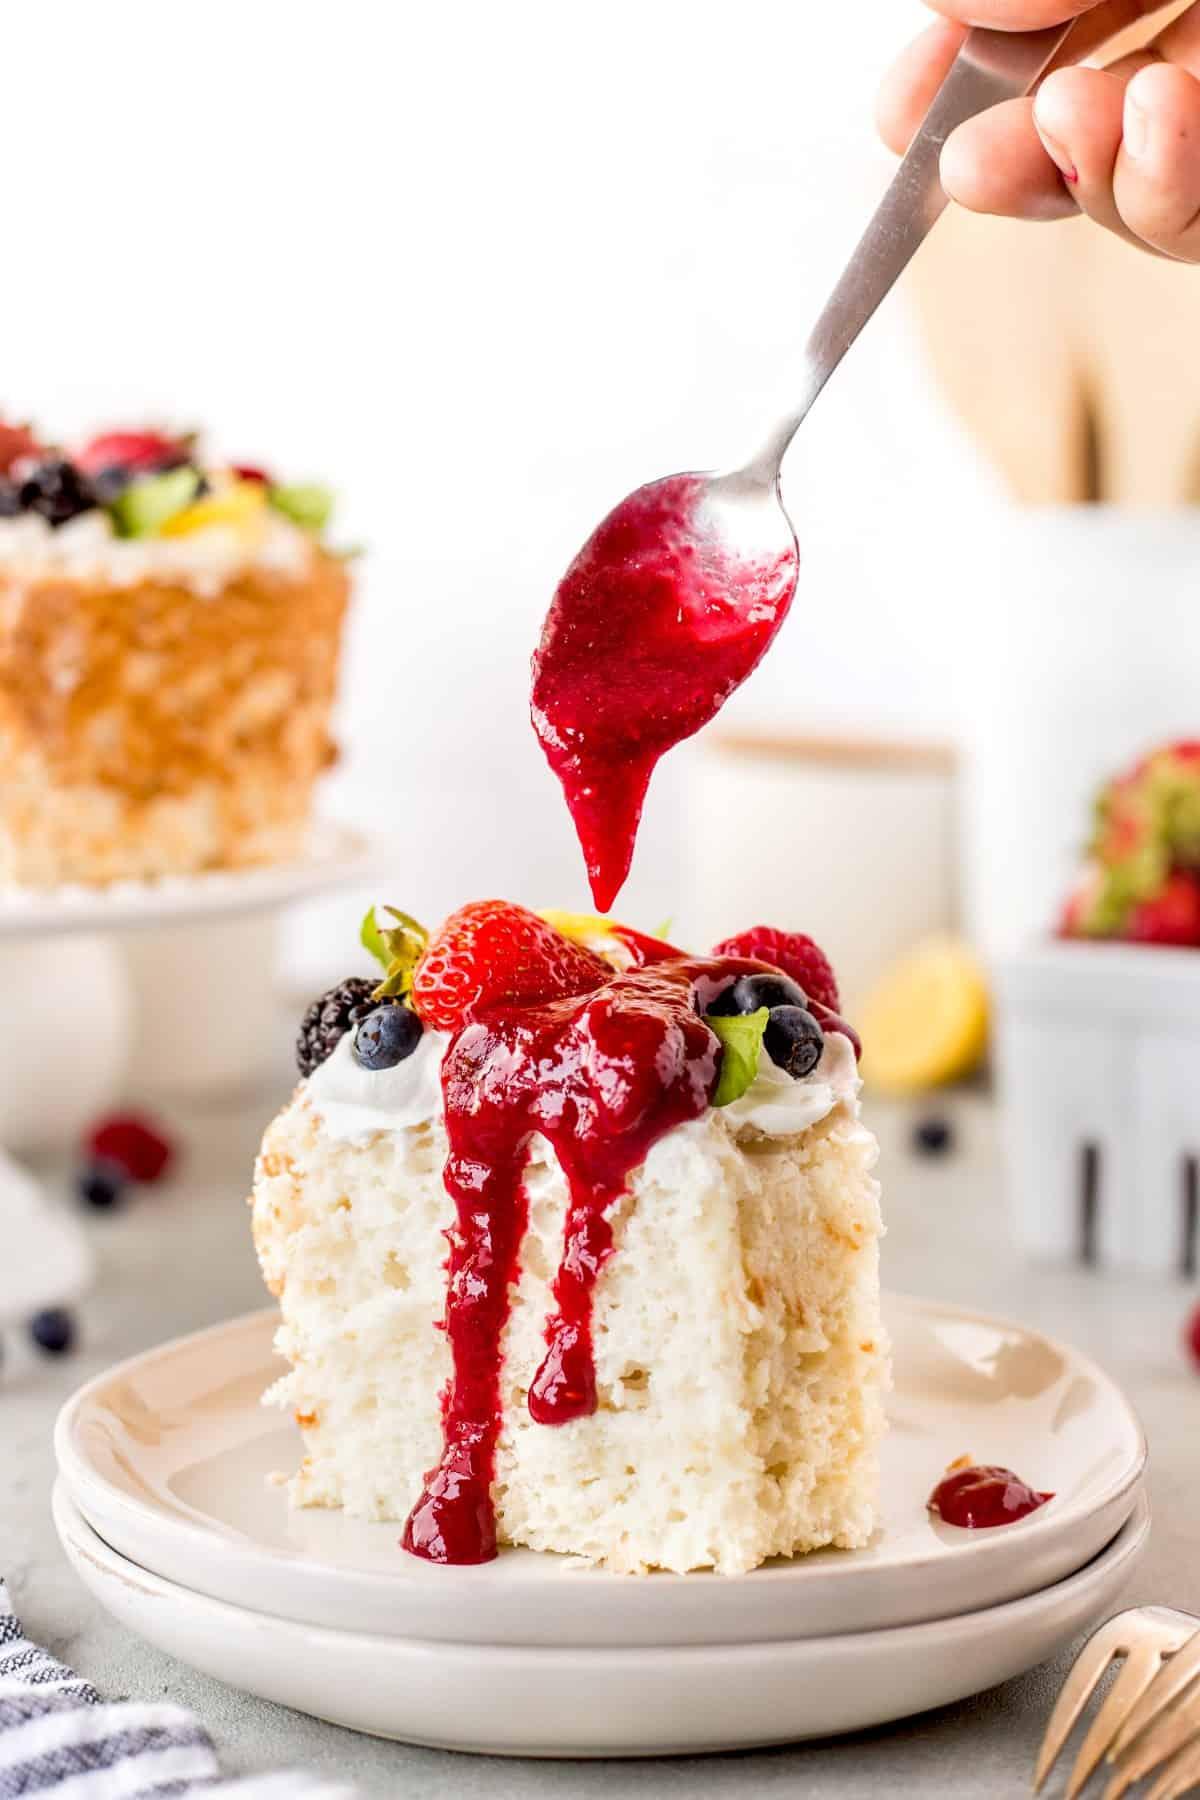 Spooning raspberry sauce onto cake